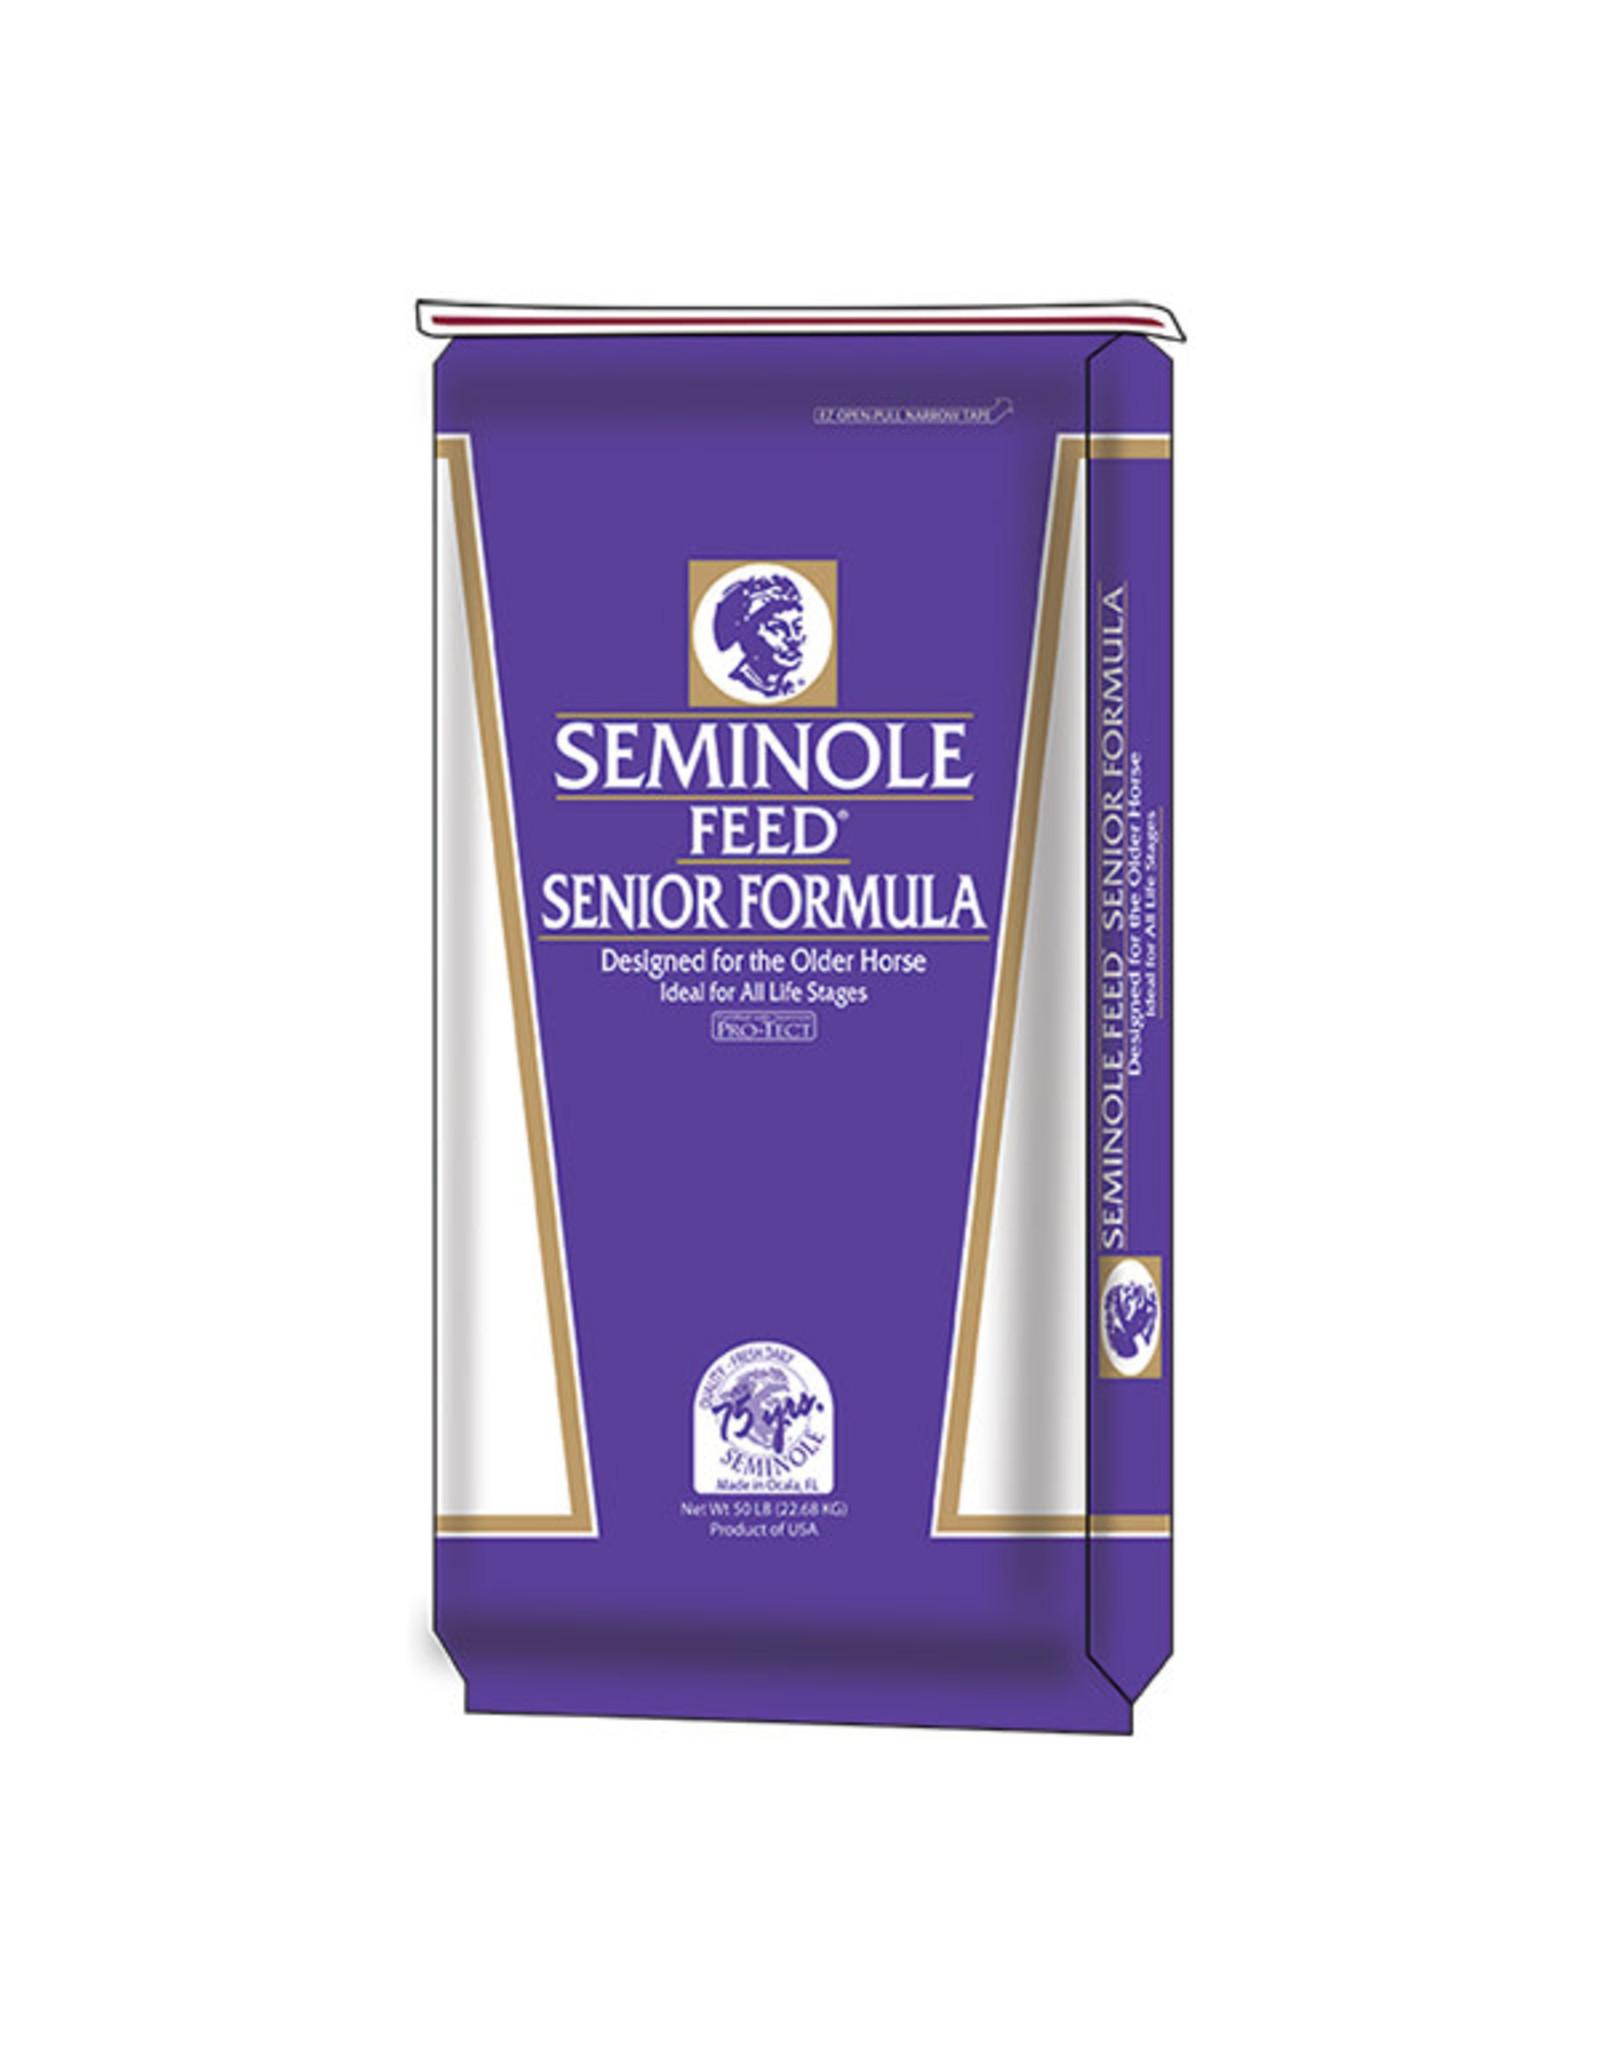 Seminole Feed 84061 Seminole Senior Formula    14/7/16